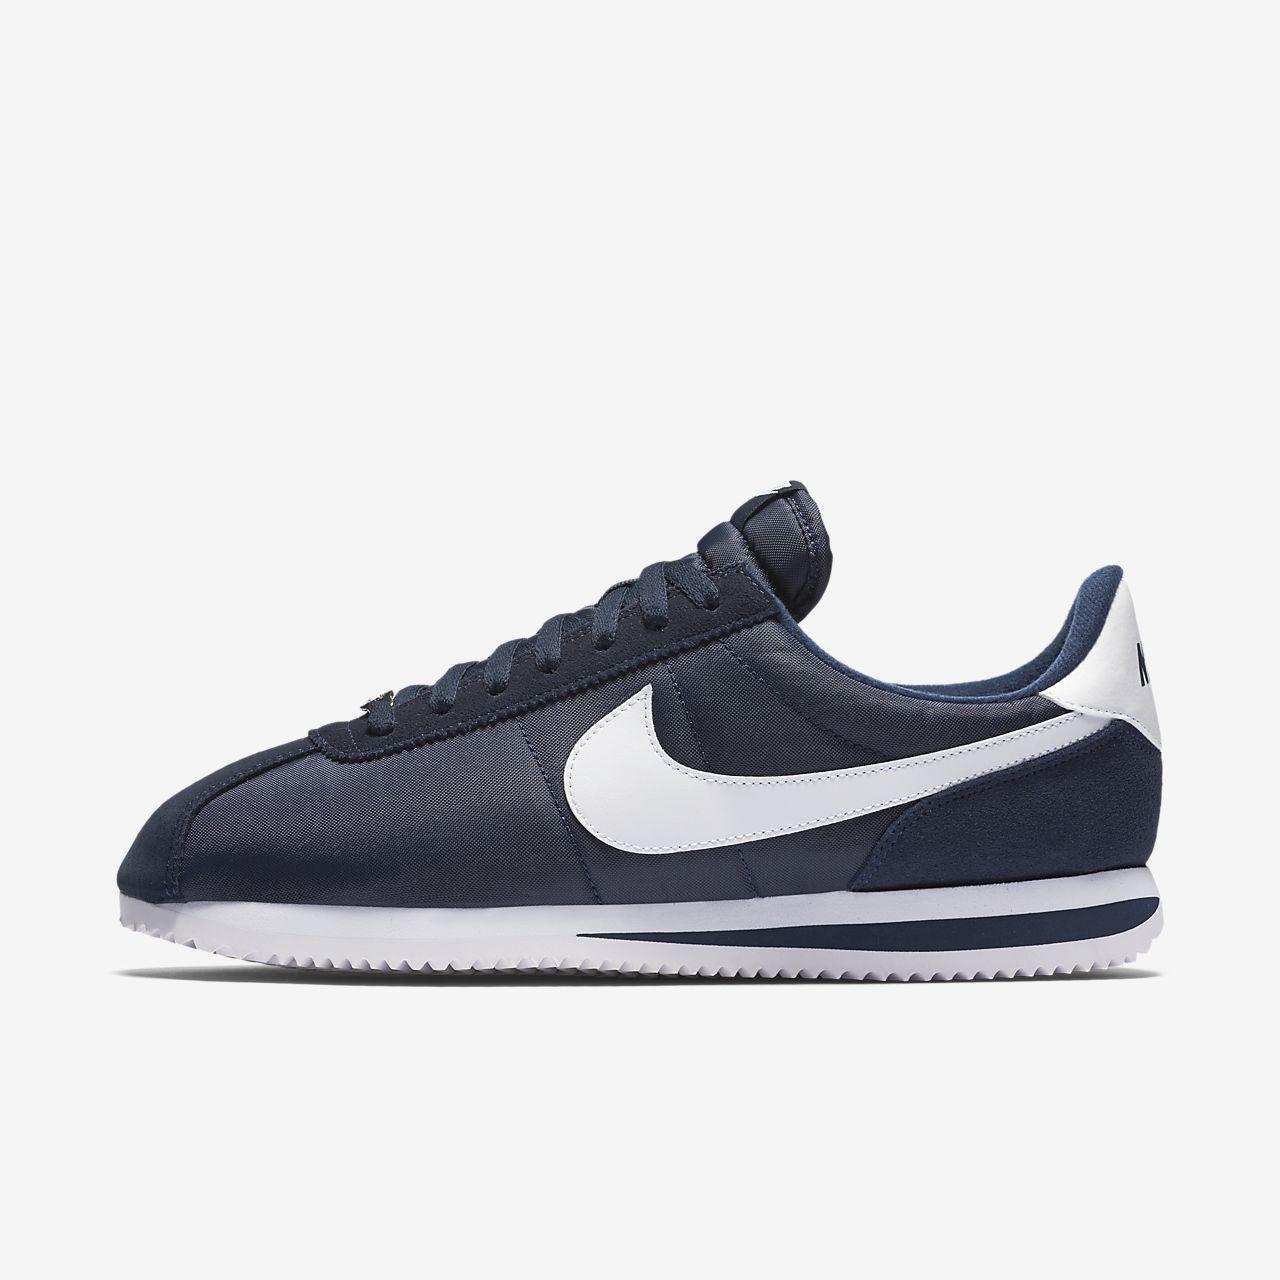 Sko Nike Cortez Basic Nylon för män